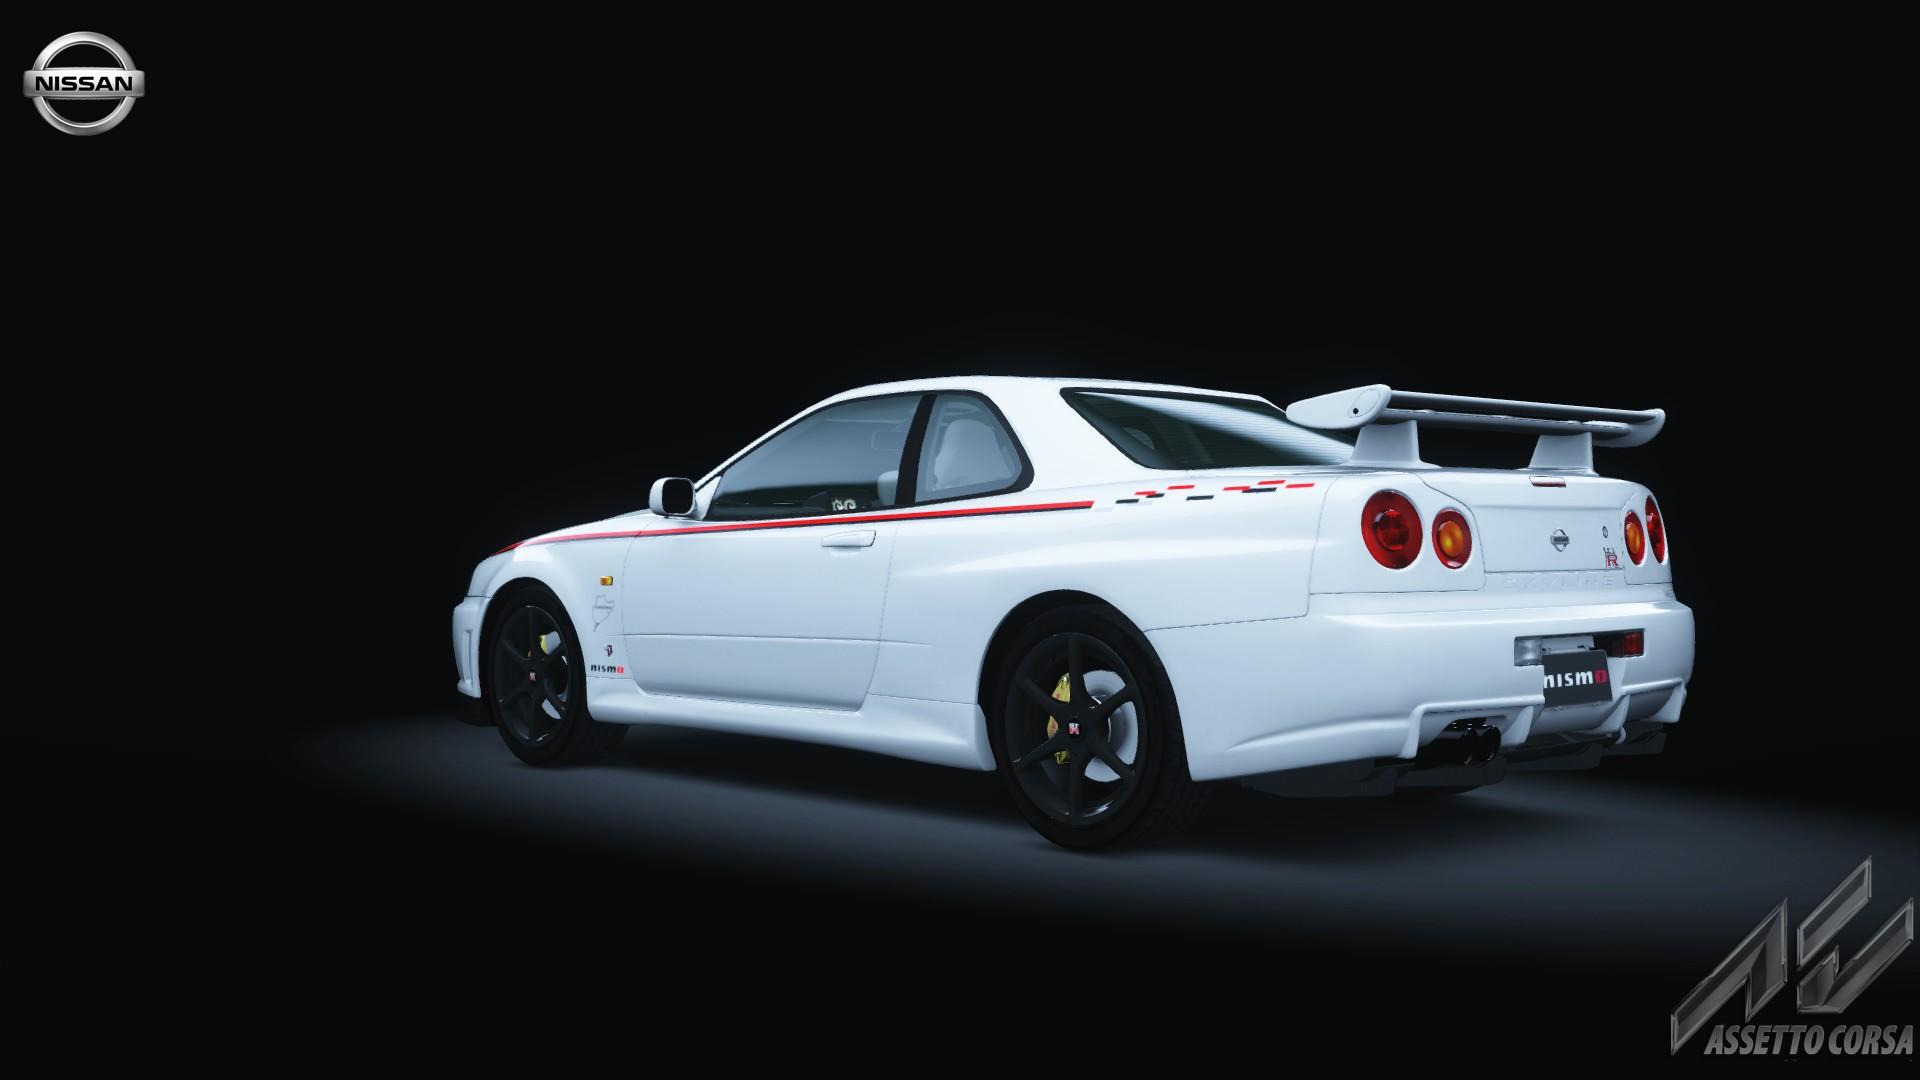 2016 Nissan Skyline >> Nissan Skyline R34 - S-Tune Livery | RaceDepartment - Latest Formula 1, Motorsport, and Sim ...